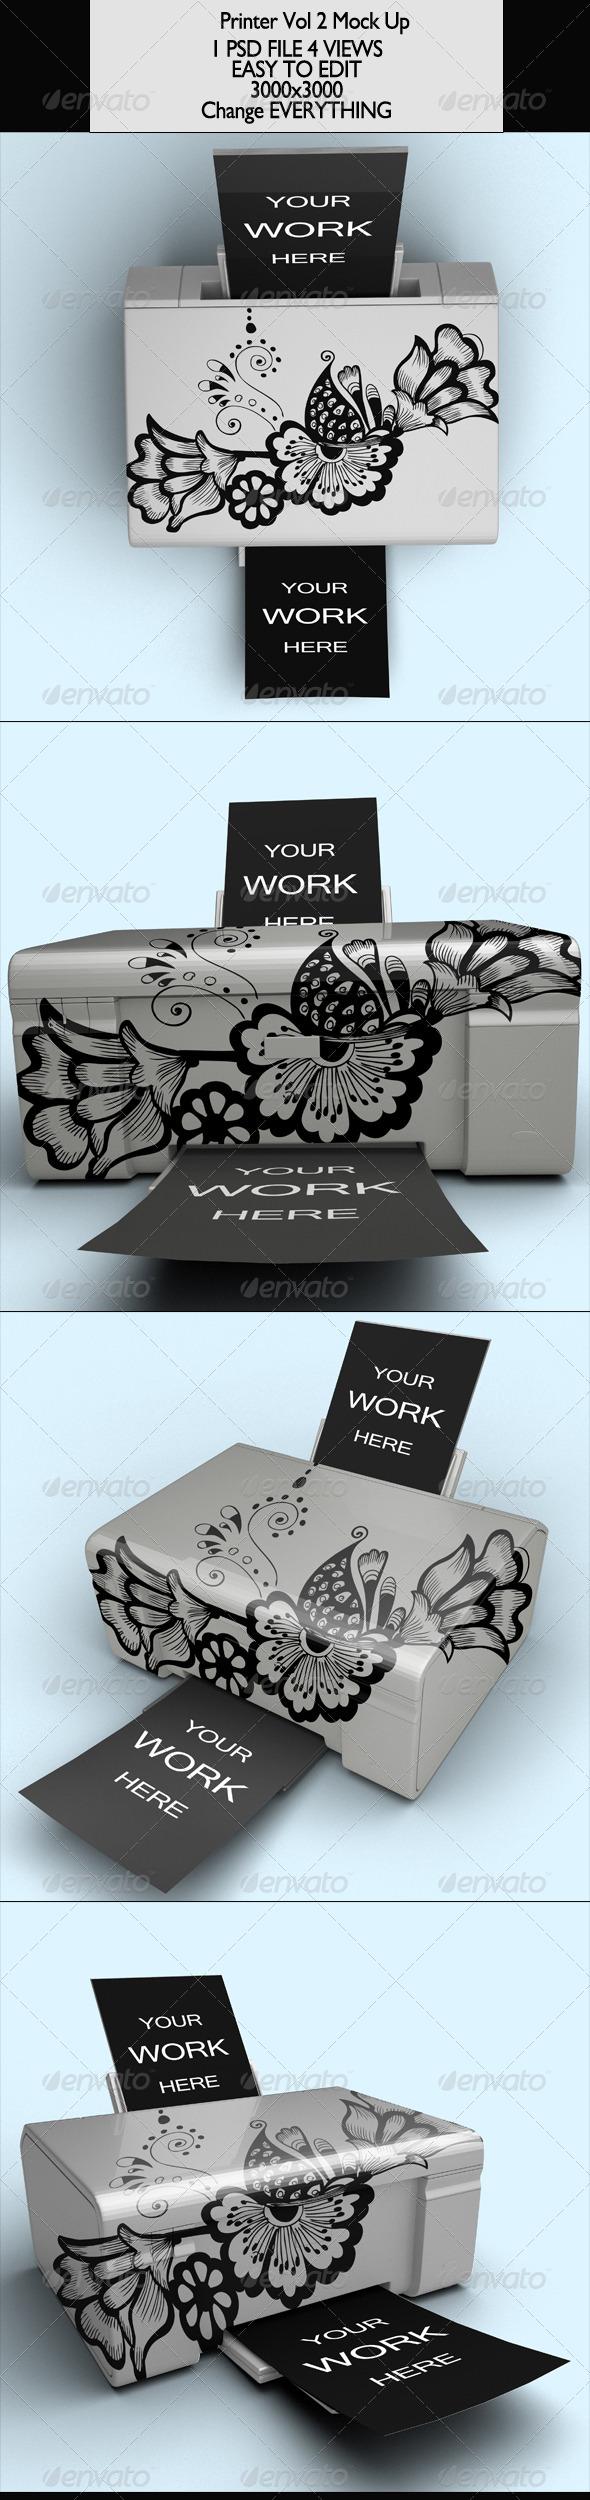 GraphicRiver Printer Vol 2 Mock-Up 7048281